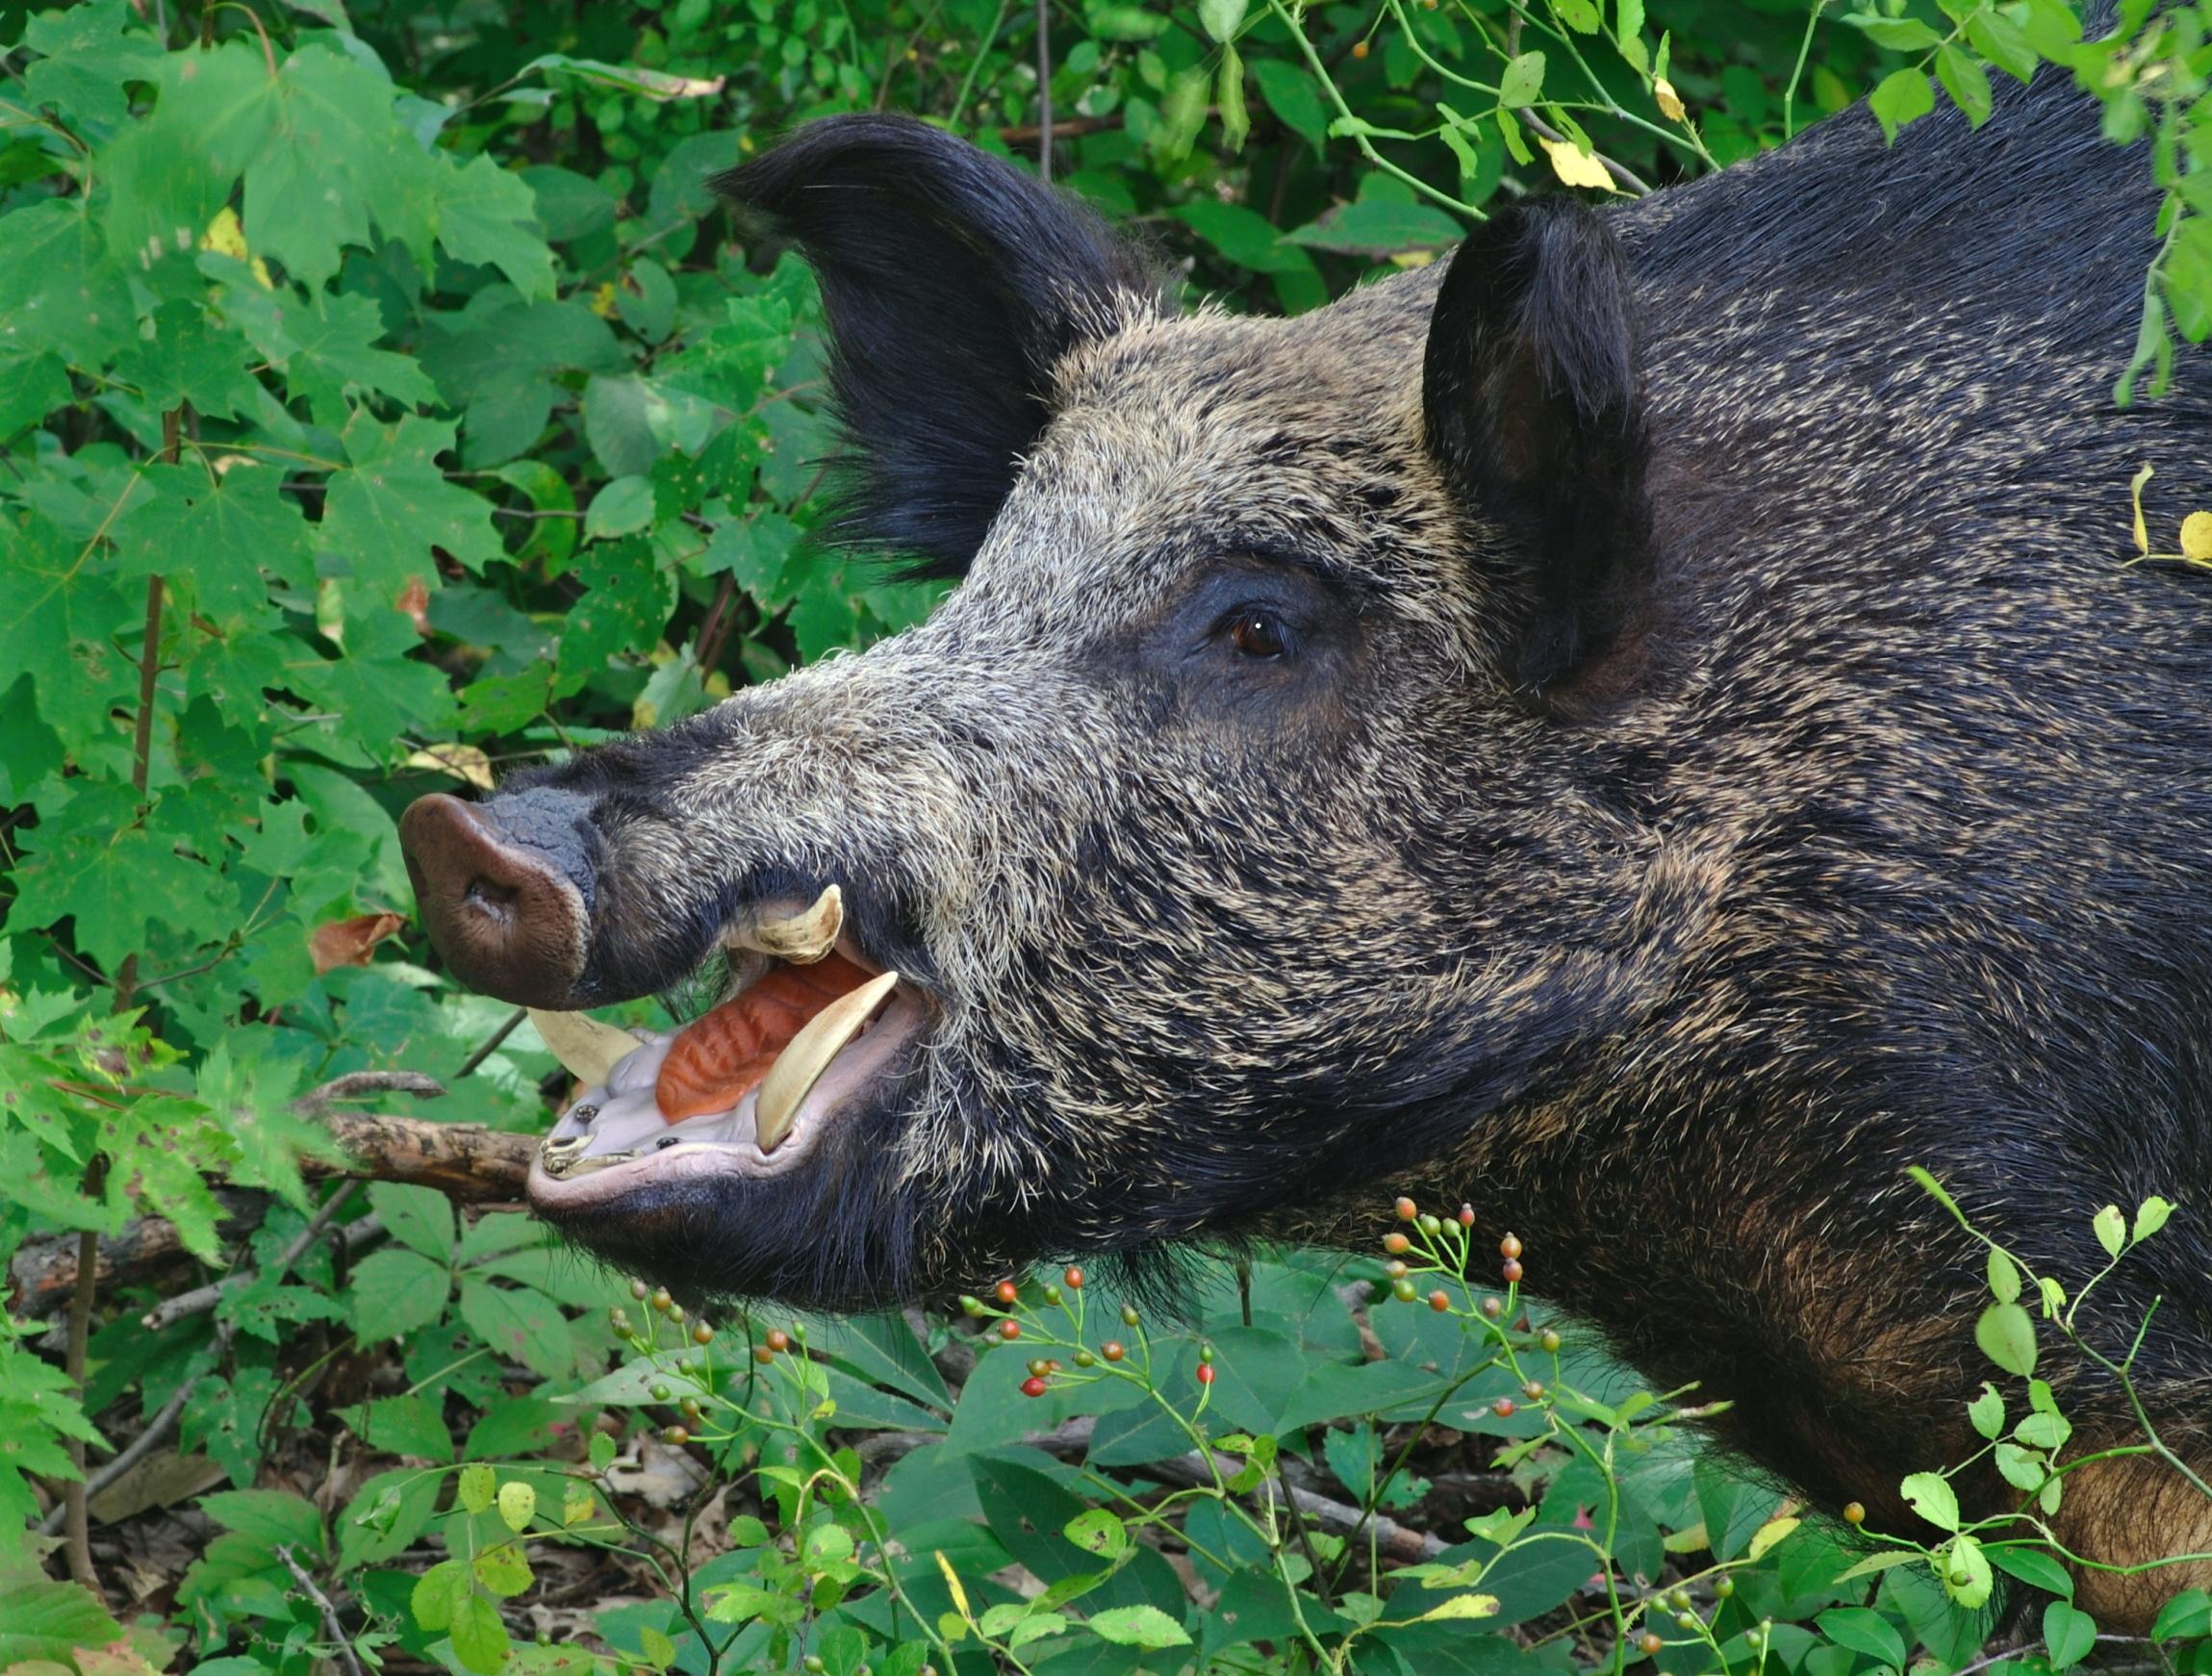 Feral hog problems in Arkansas described as 'World War III'